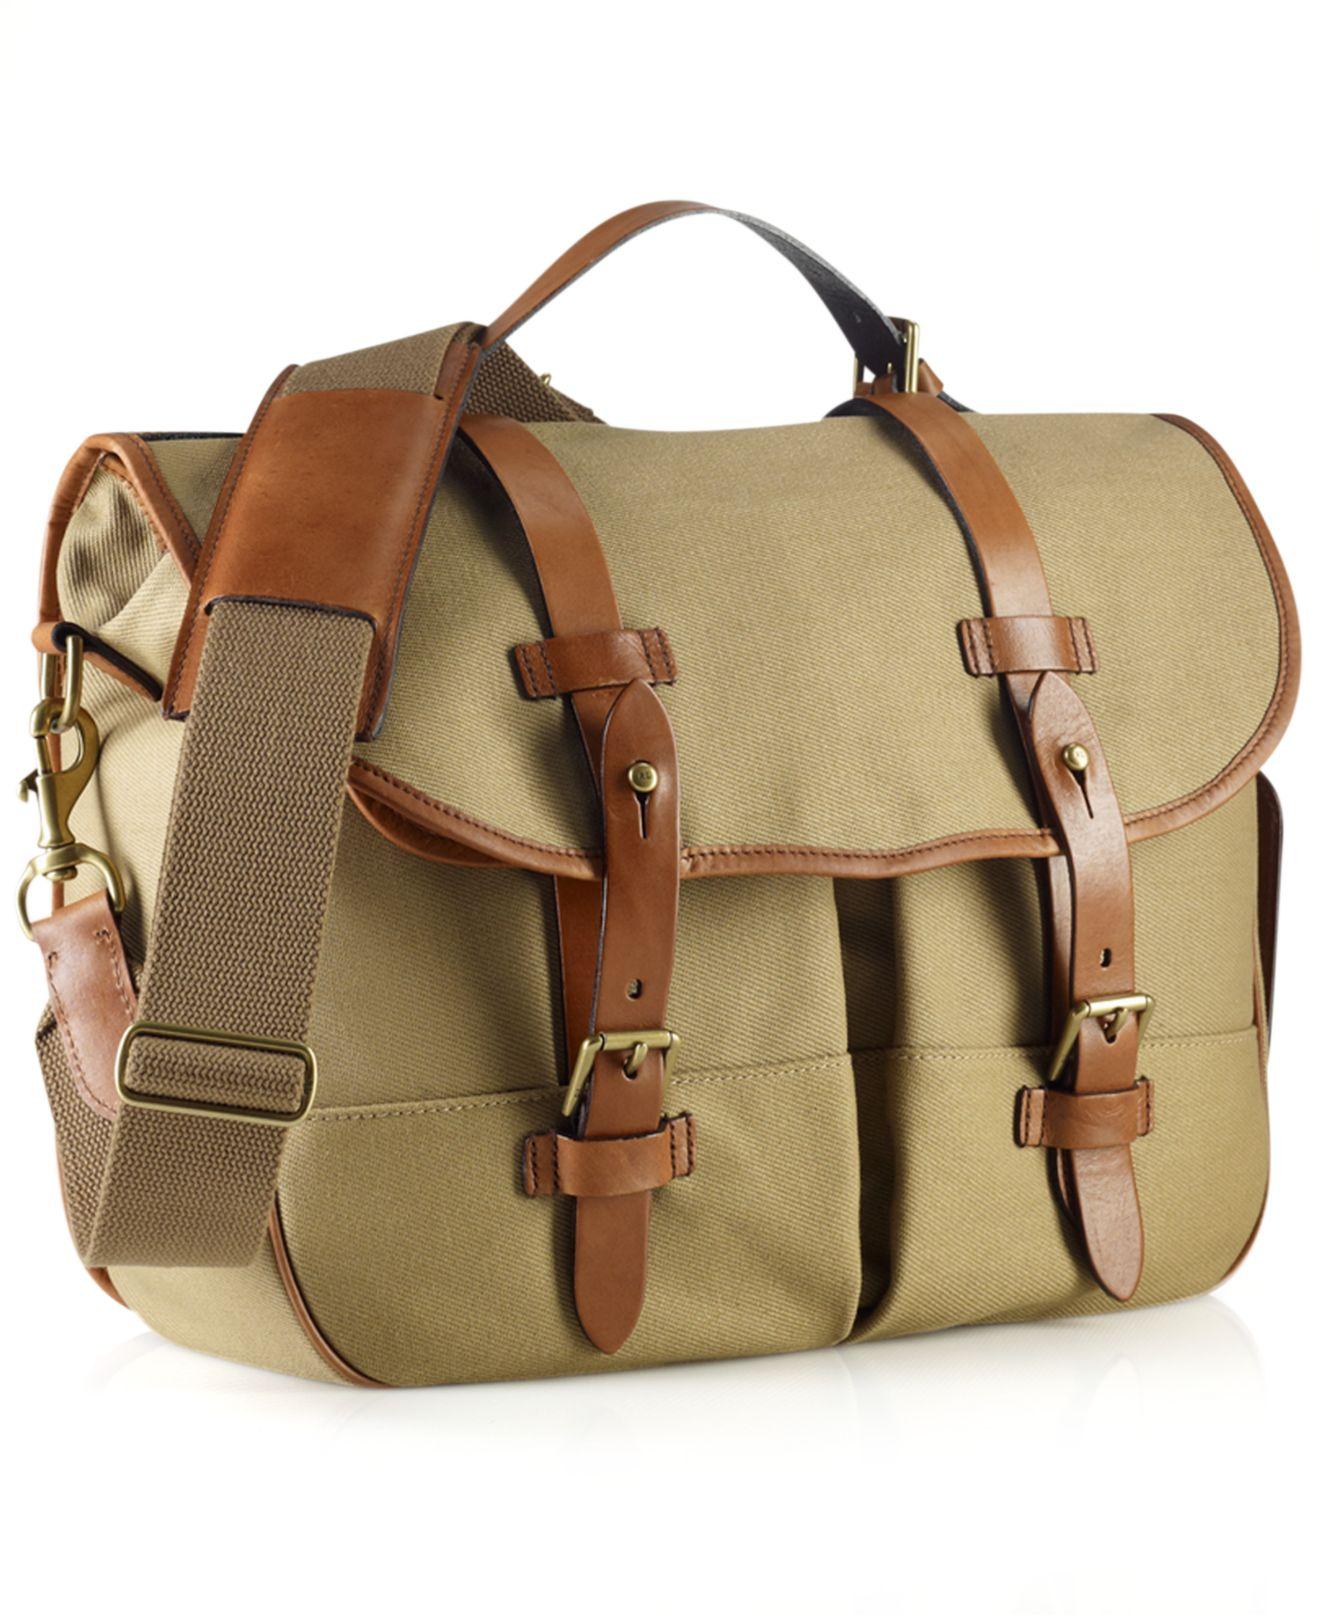 ... release date lyst polo ralph lauren core canvas messenger bag in  natural for men fc0e8 9b96b ... 5c05d119c71e3